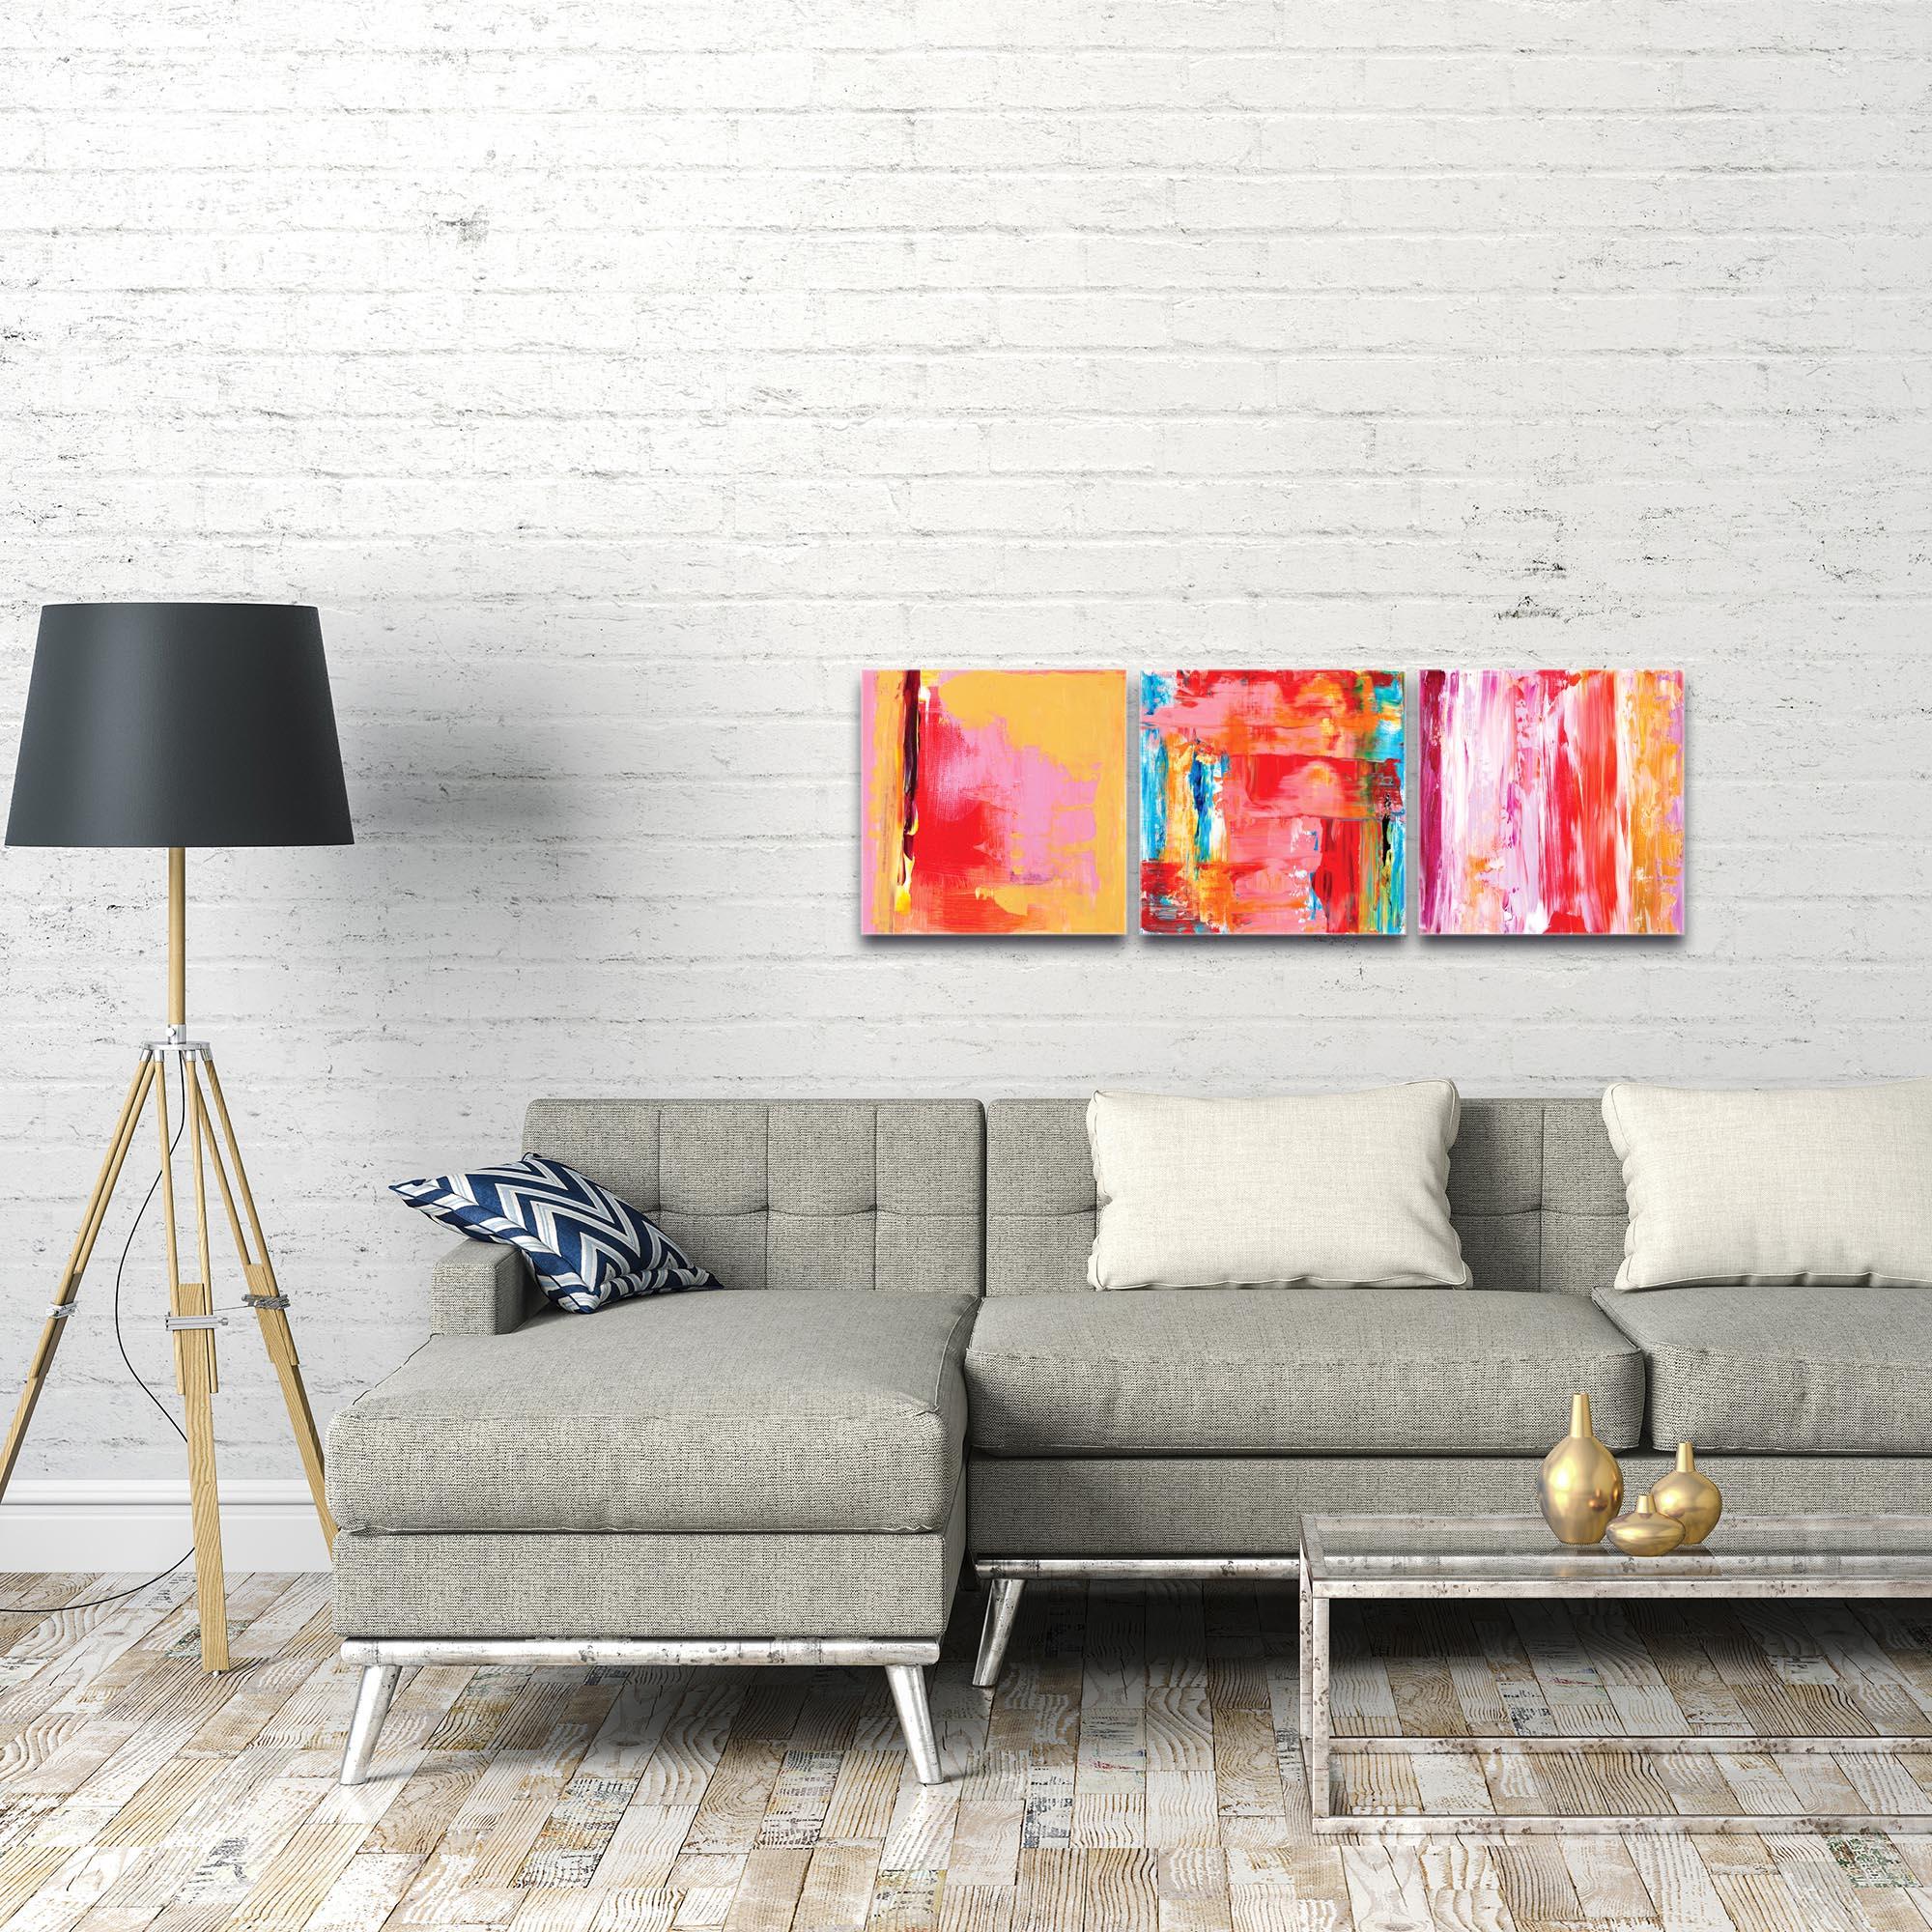 Abstract Wall Art 'Urban Triptych 3' - Urban Decor on Metal or Plexiglass - Image 3